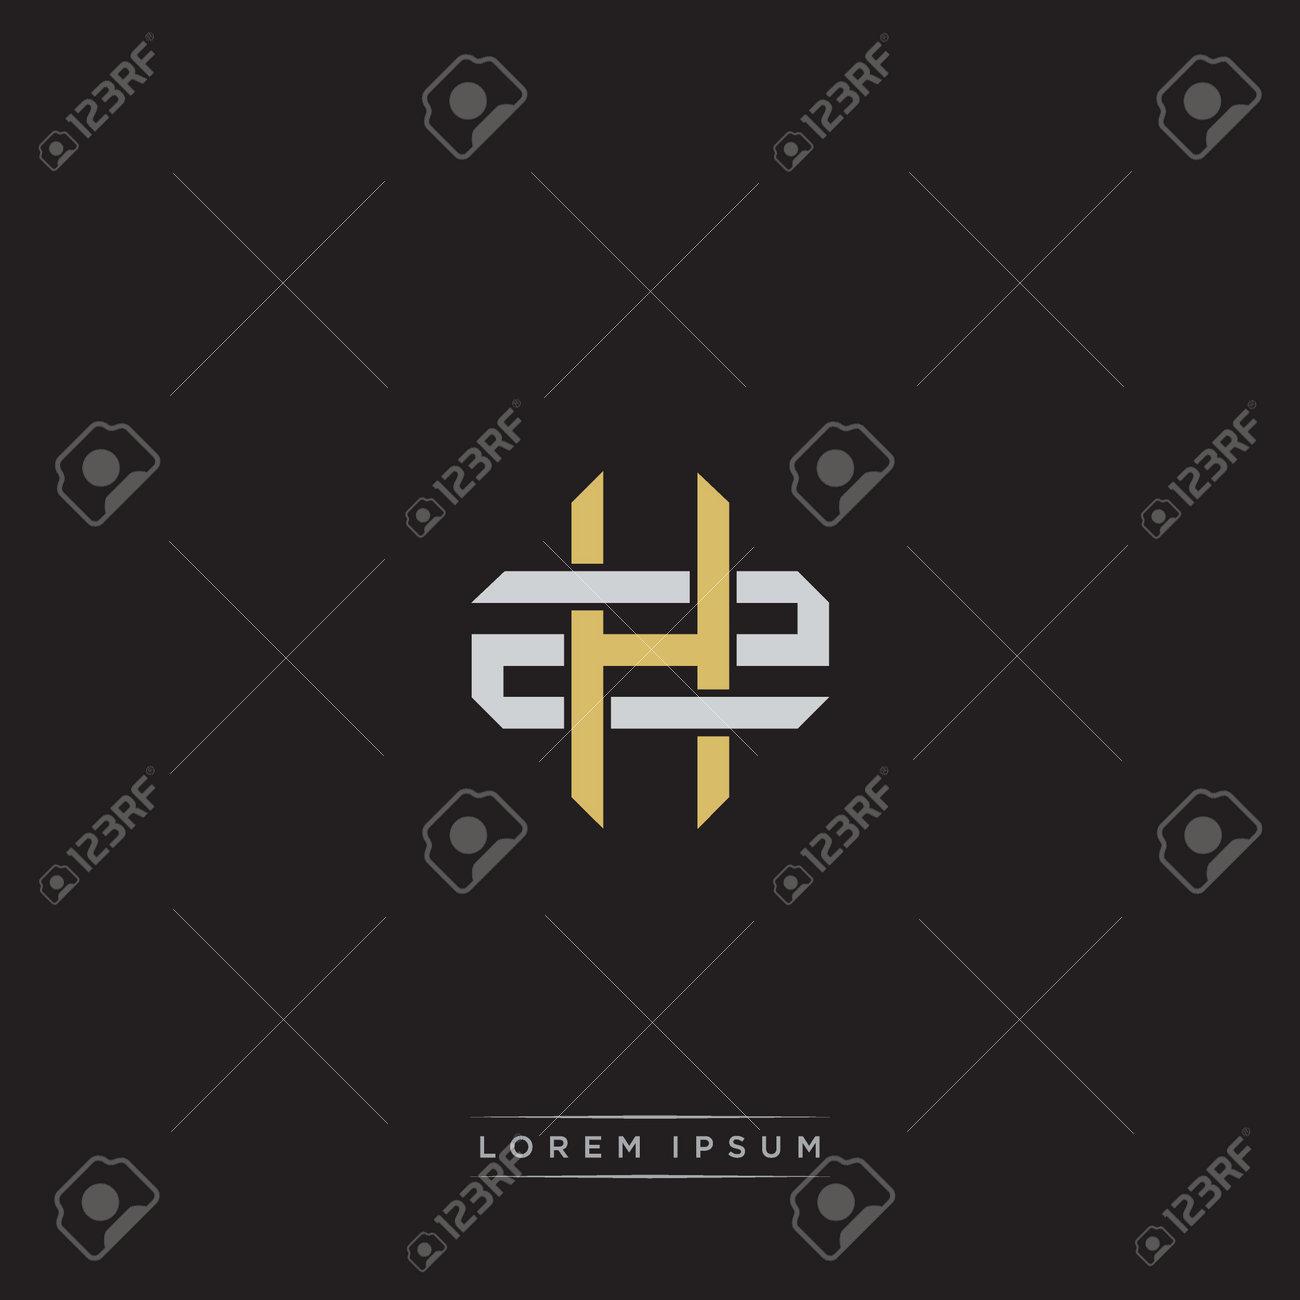 Initial letter overlapping interlock logo monogram line art style isolated on black background template - 169061357